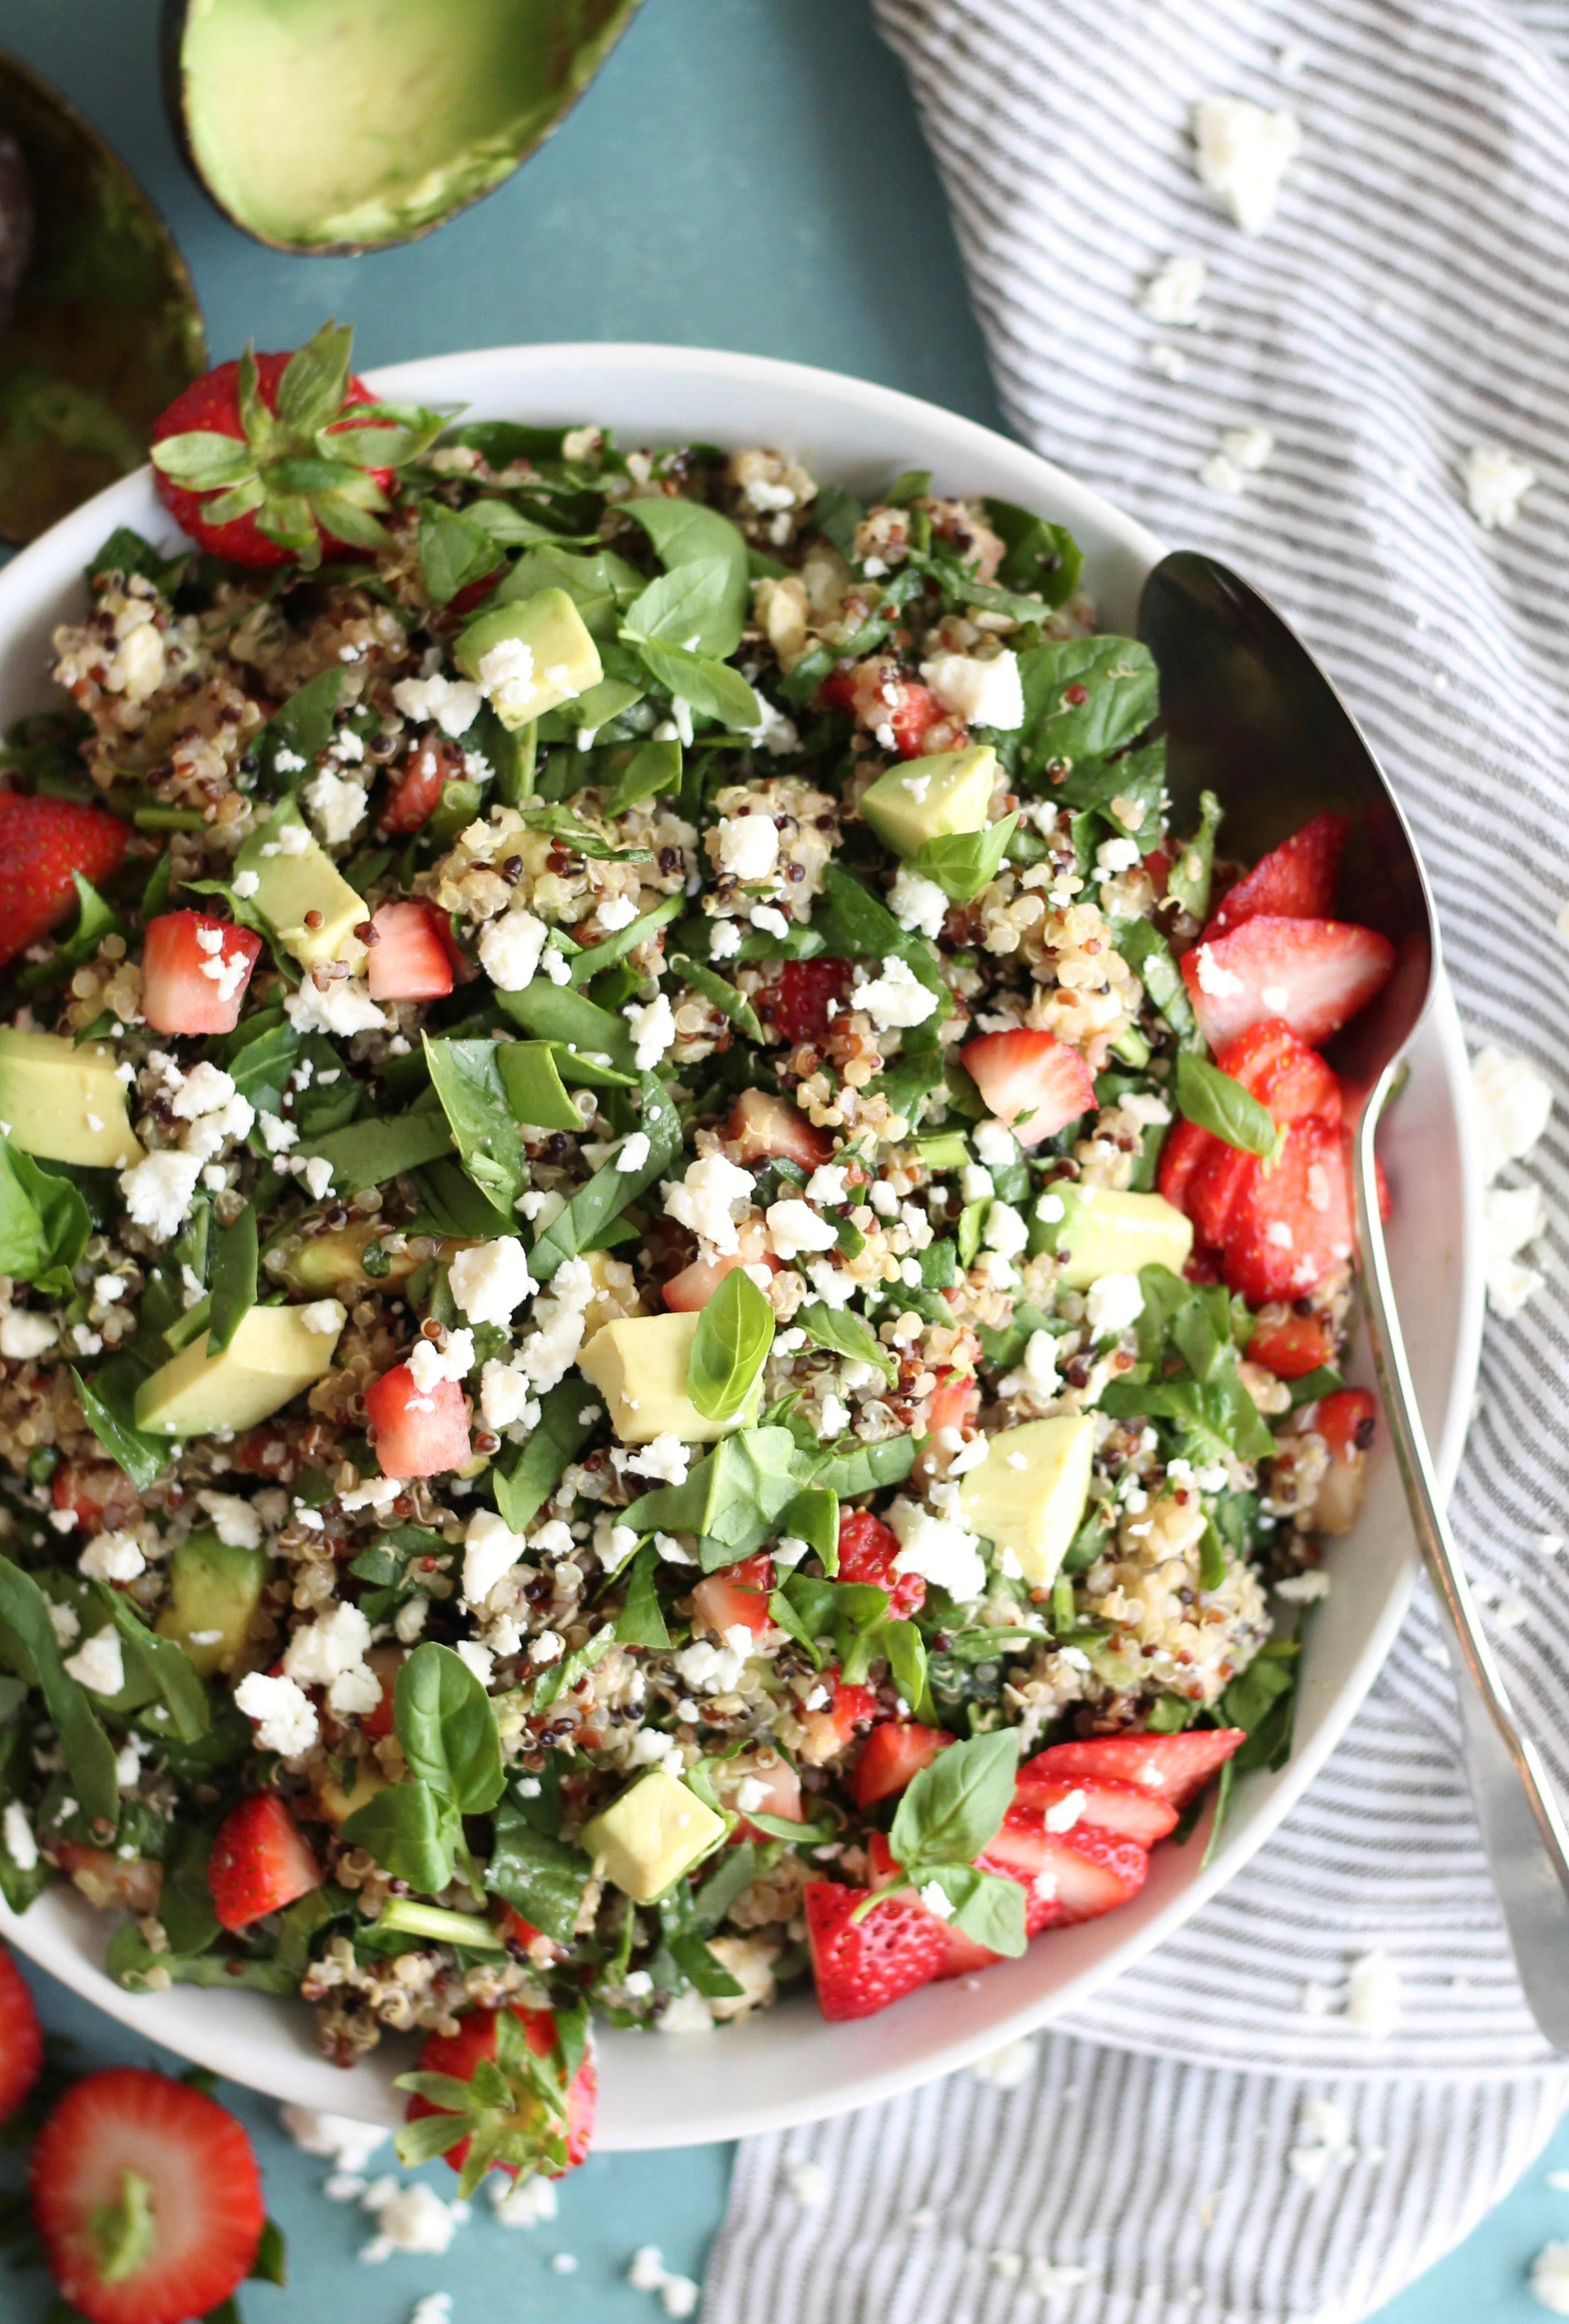 Quinoa Spinach Salad  Strawberry Avocado Feta Spinach Quinoa Salad with Basil